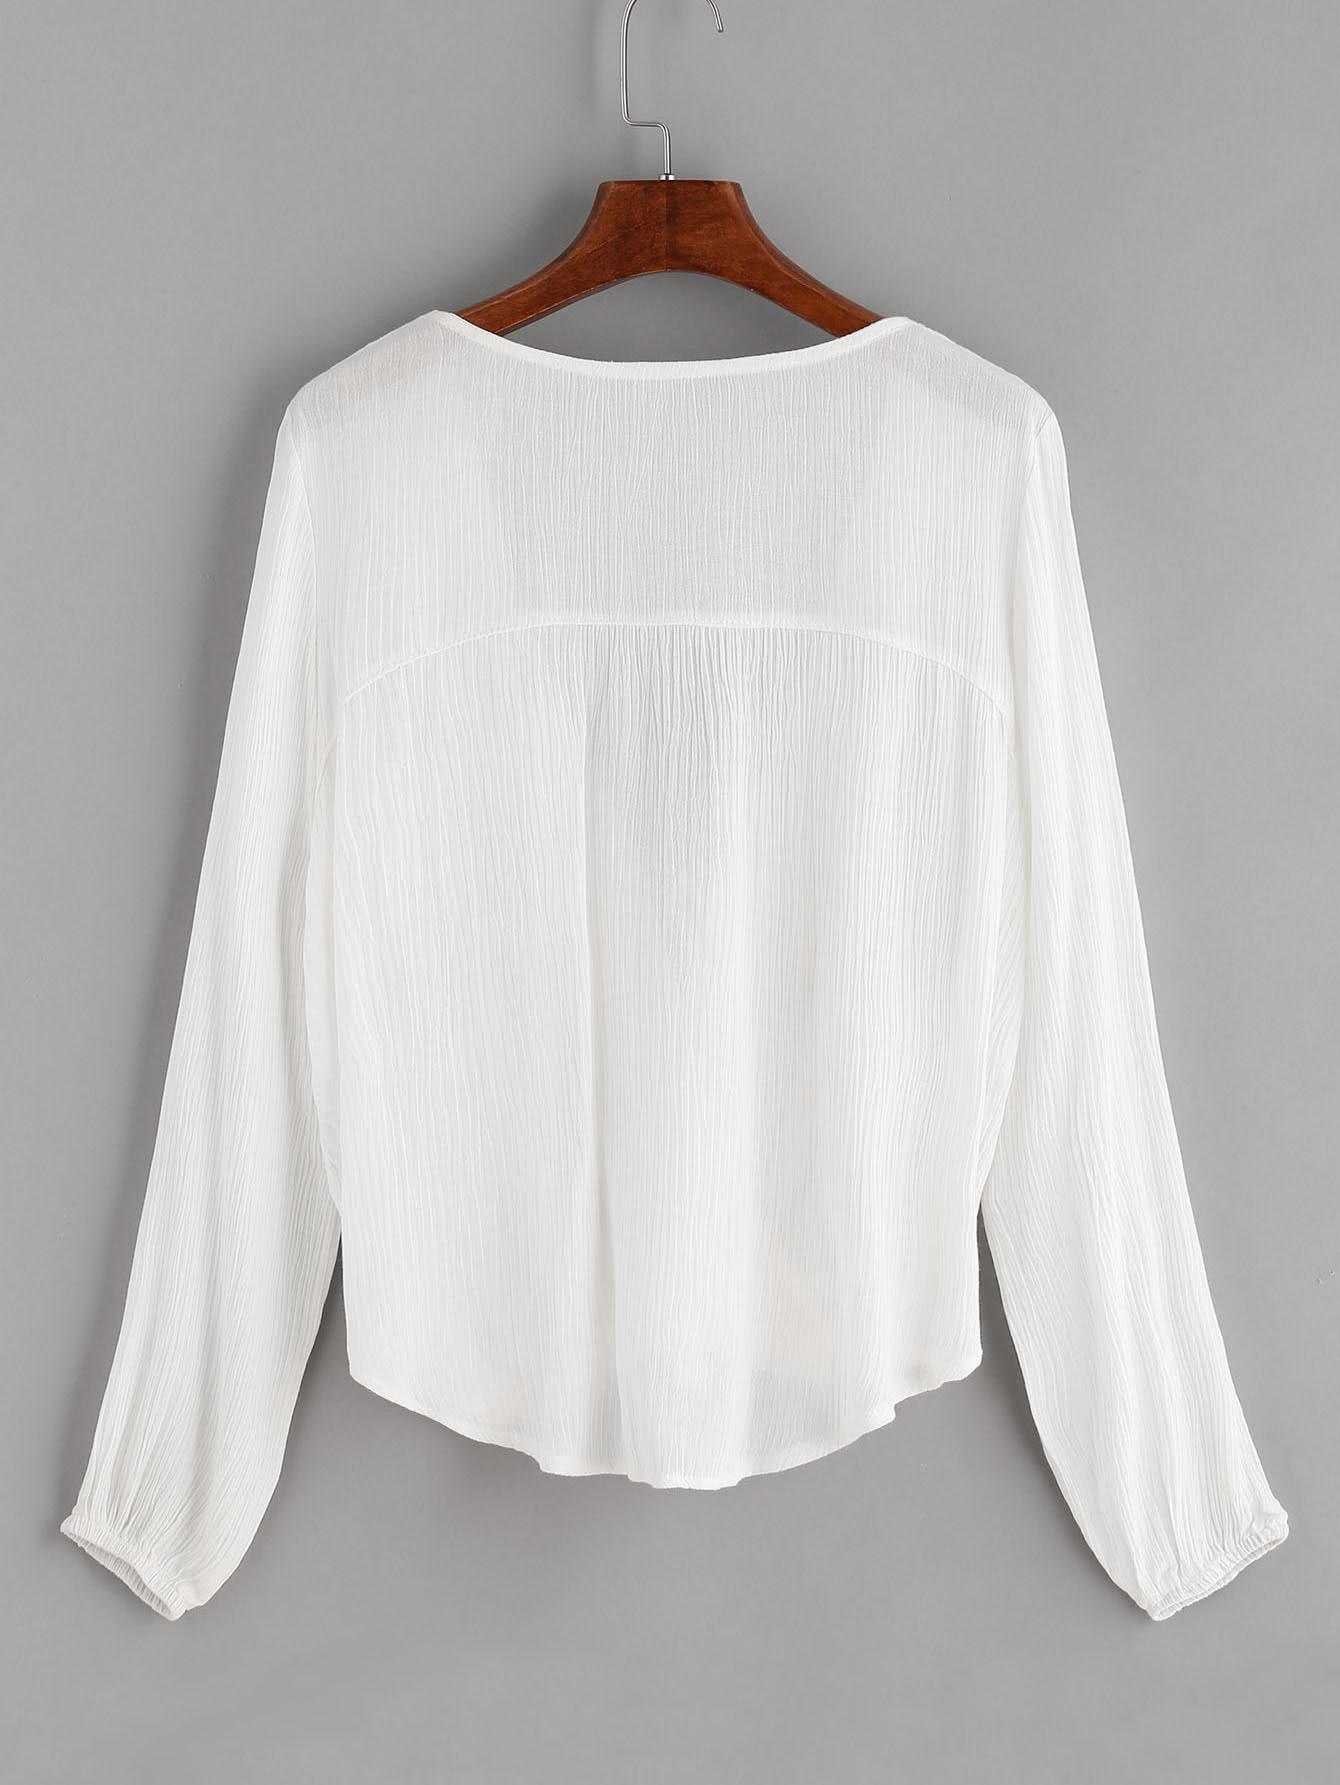 blouse170307001_2